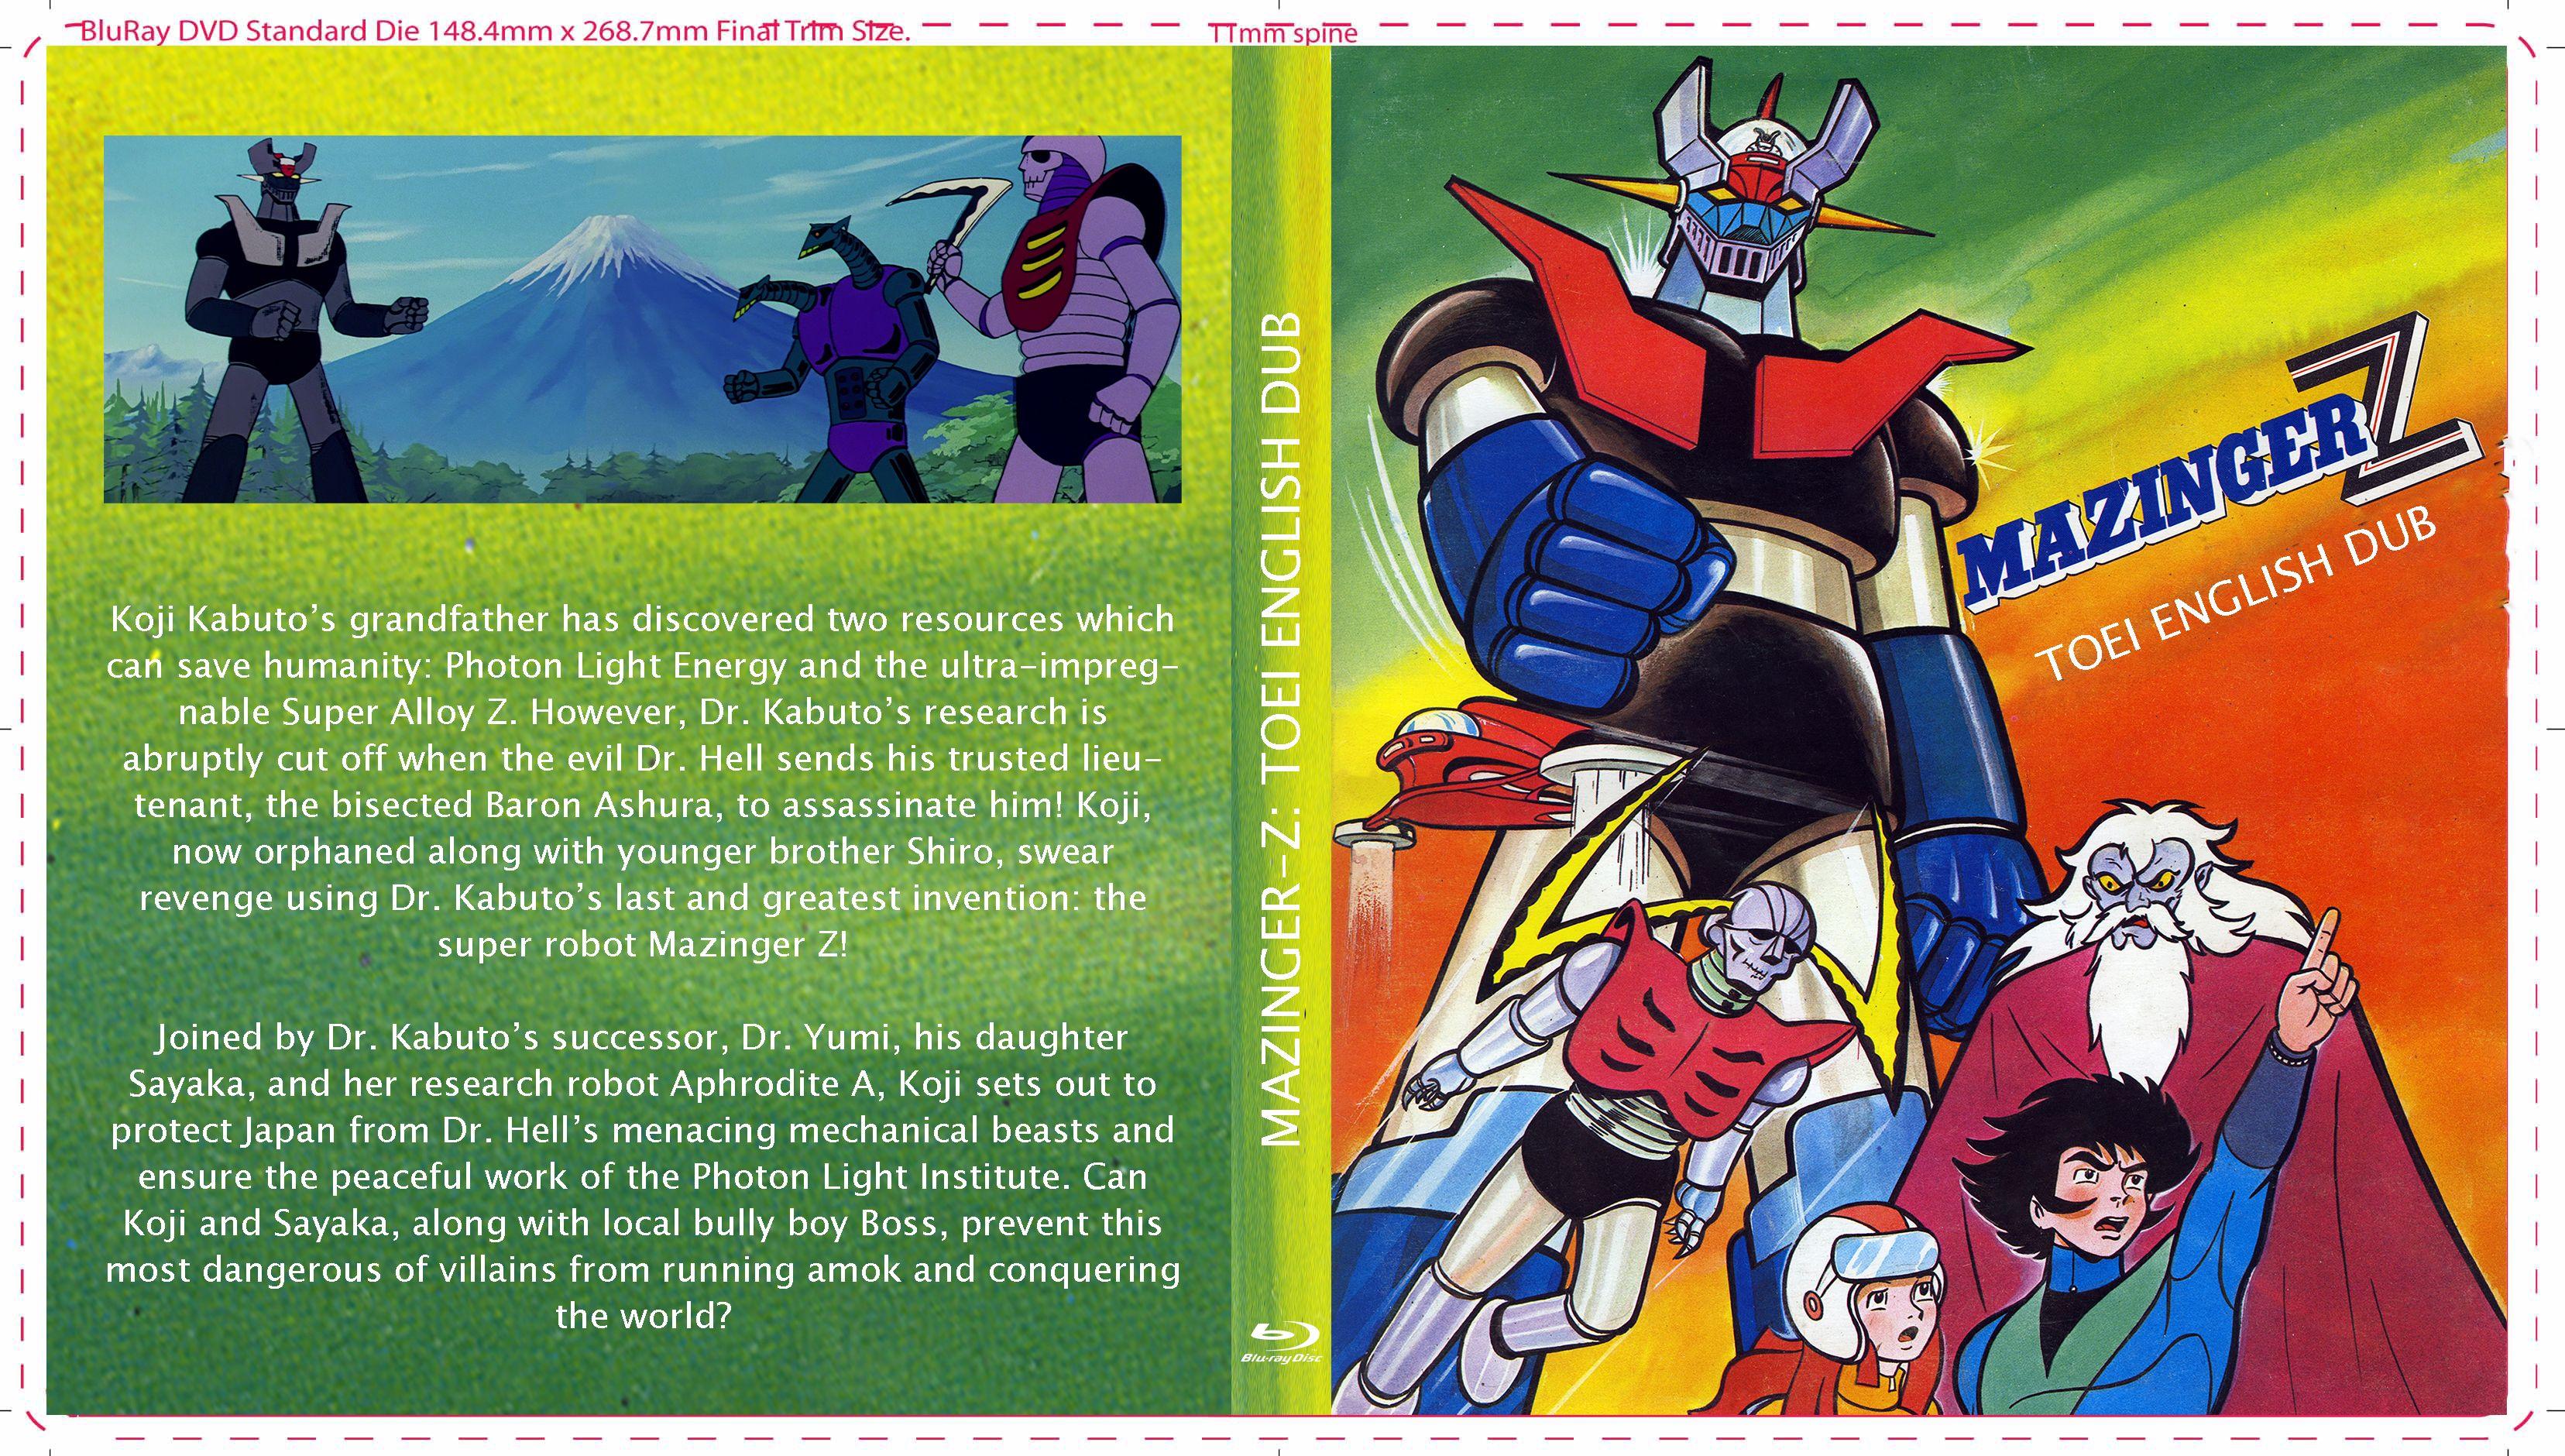 Impreg Comics Amazing mazinger-z: toei enlish dub (blu-ray cover) | mazinger-z (1972